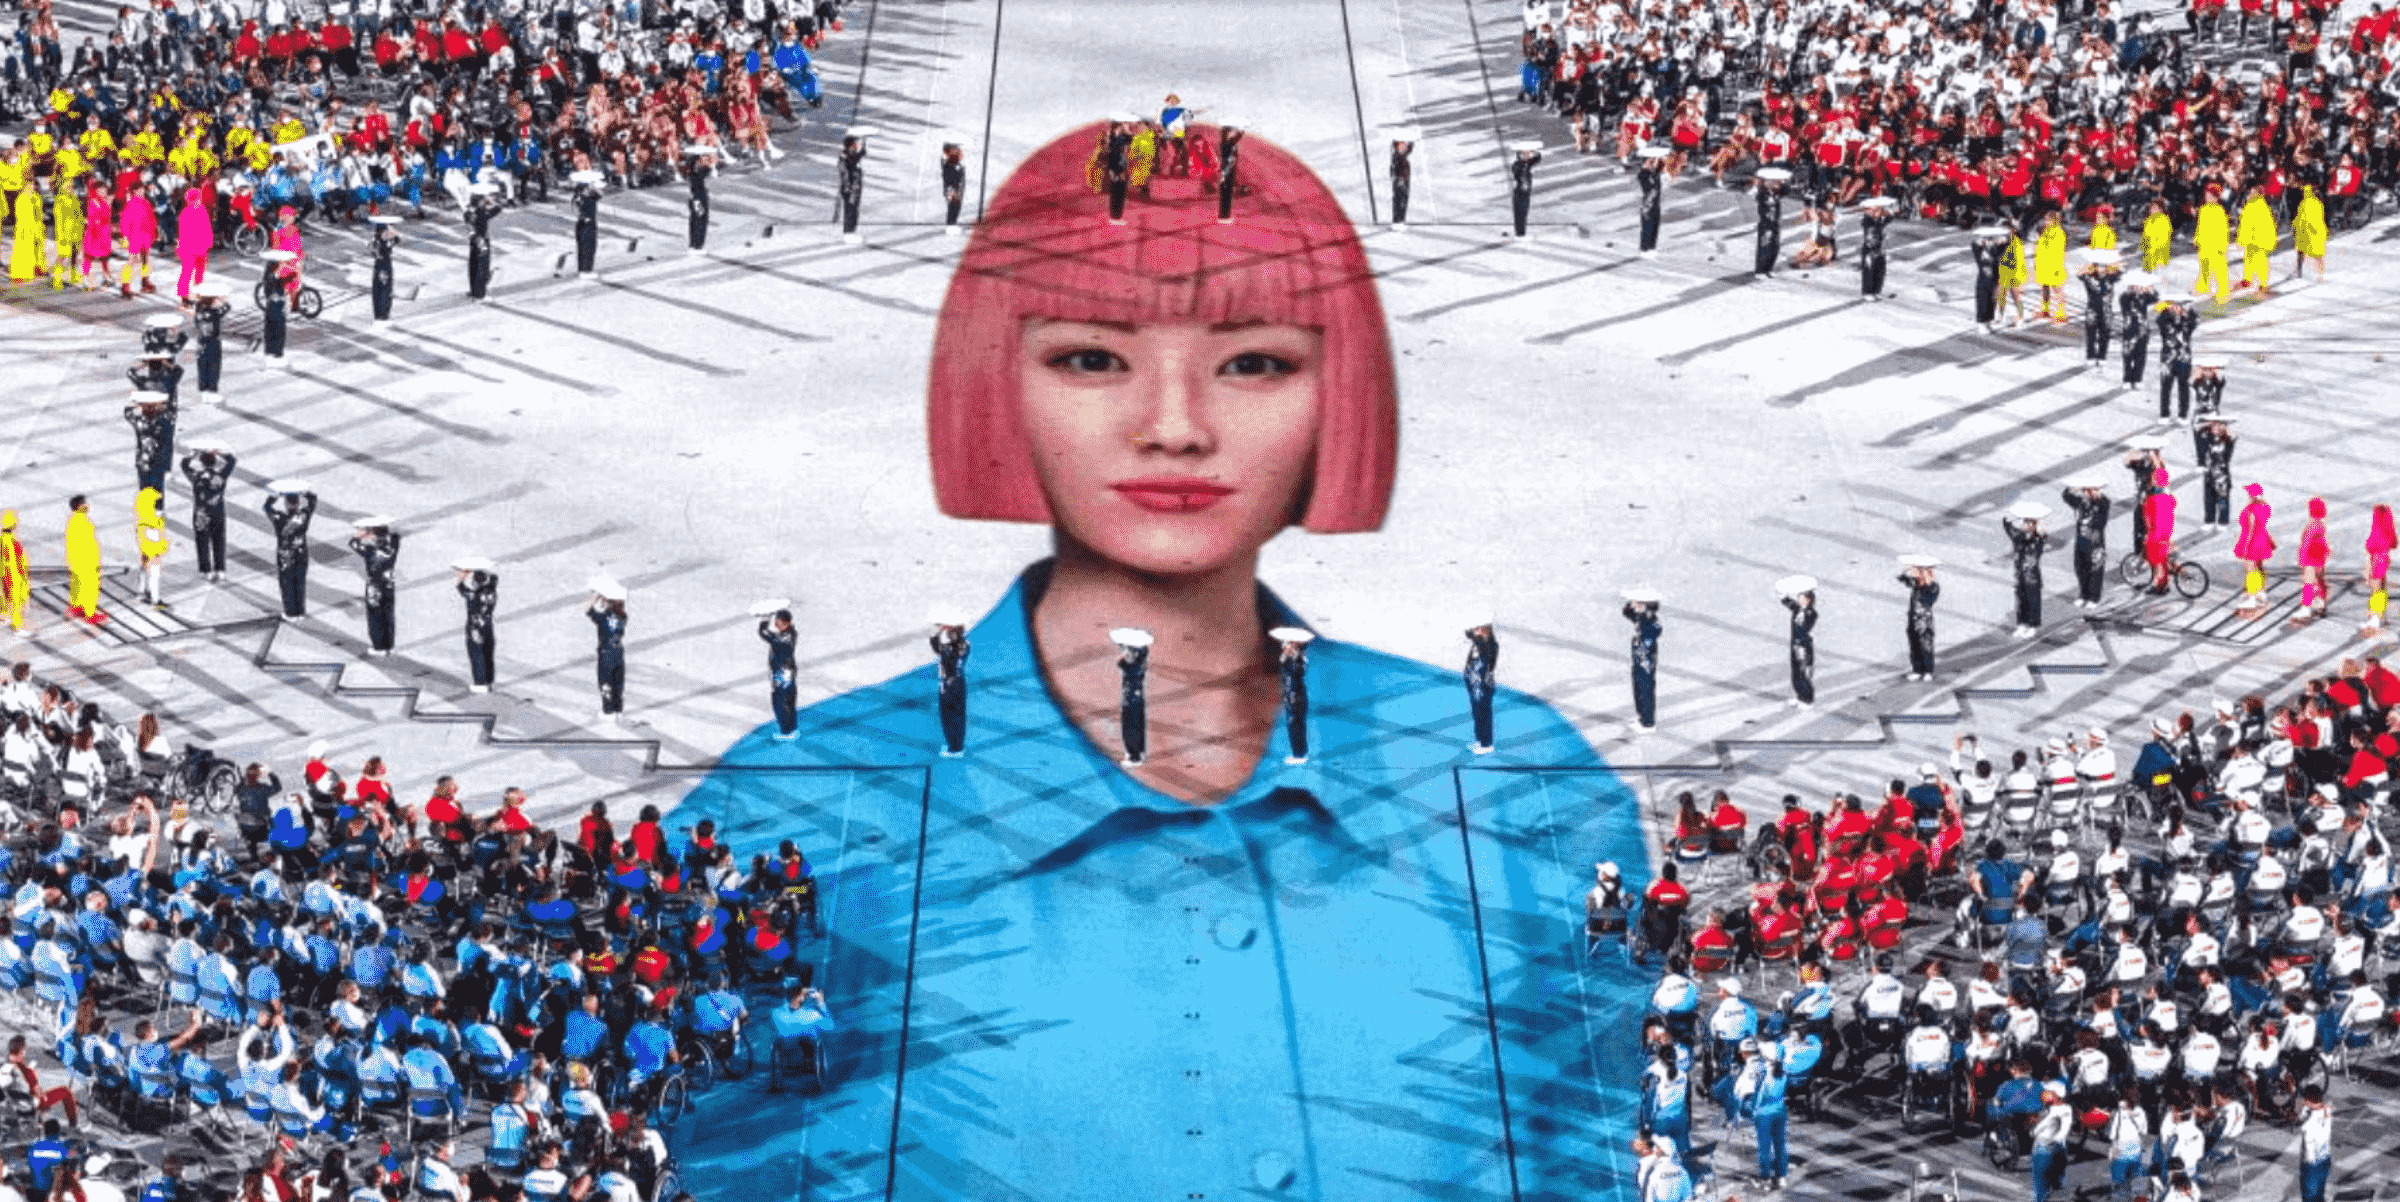 2020 Paralympics Partner With Virtual Influencer Imma Gram